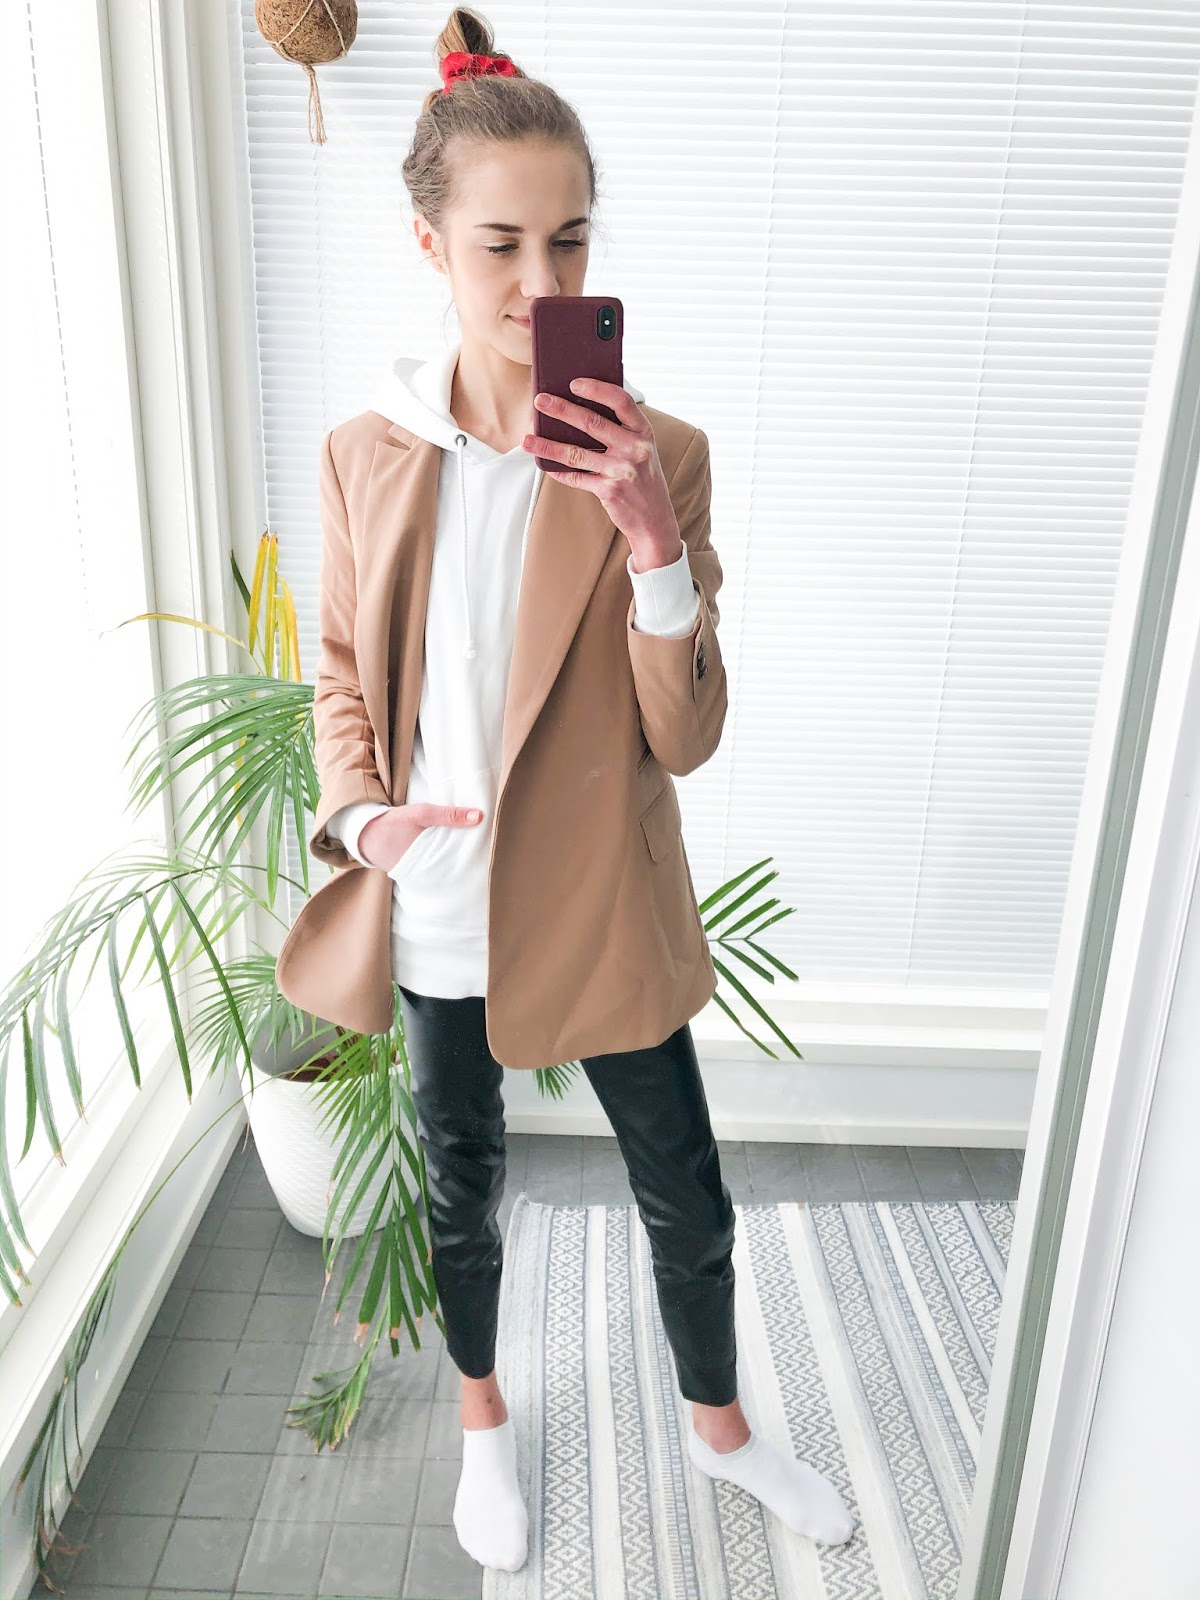 Hoodie/sweatshirt and blazer outfit / Huppari ja bleiseri, asuinspiraatio, muoti, bloggaaja